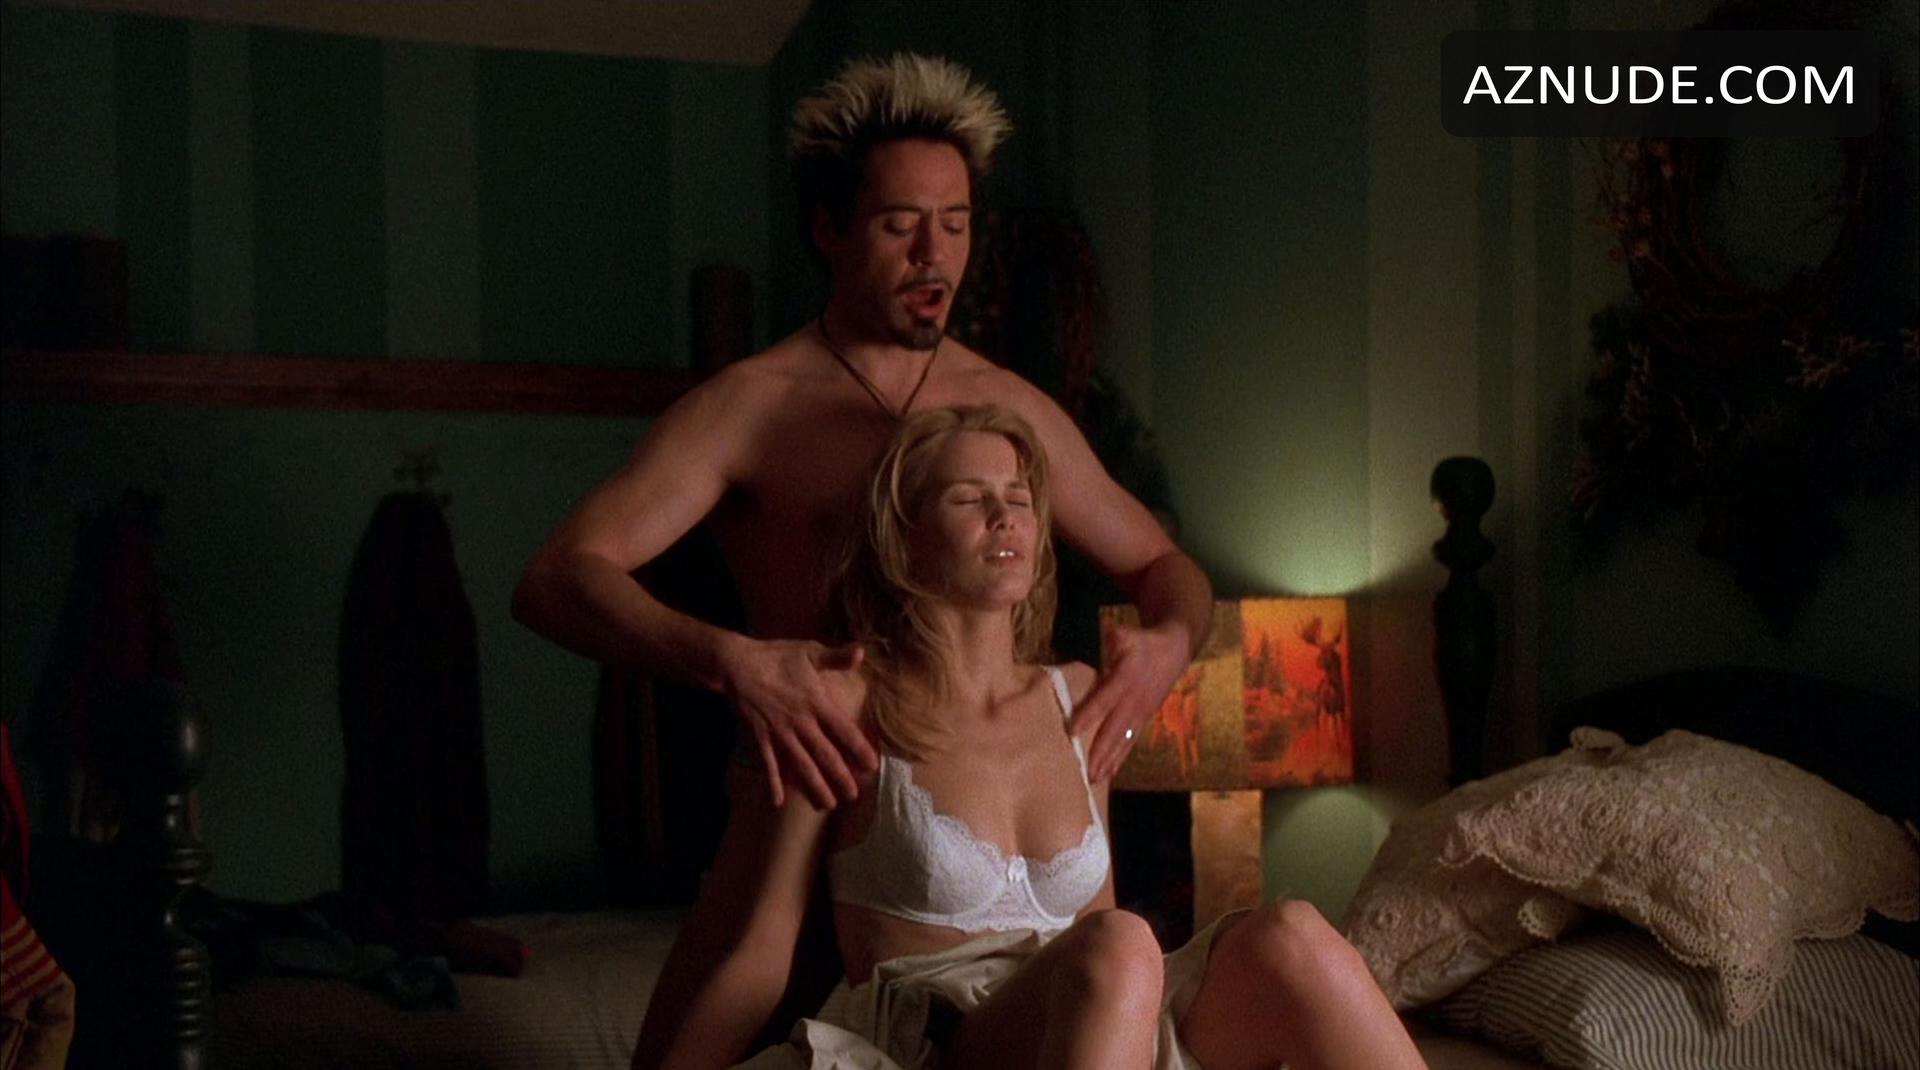 from Rowan claudia schiffer nude sex tape